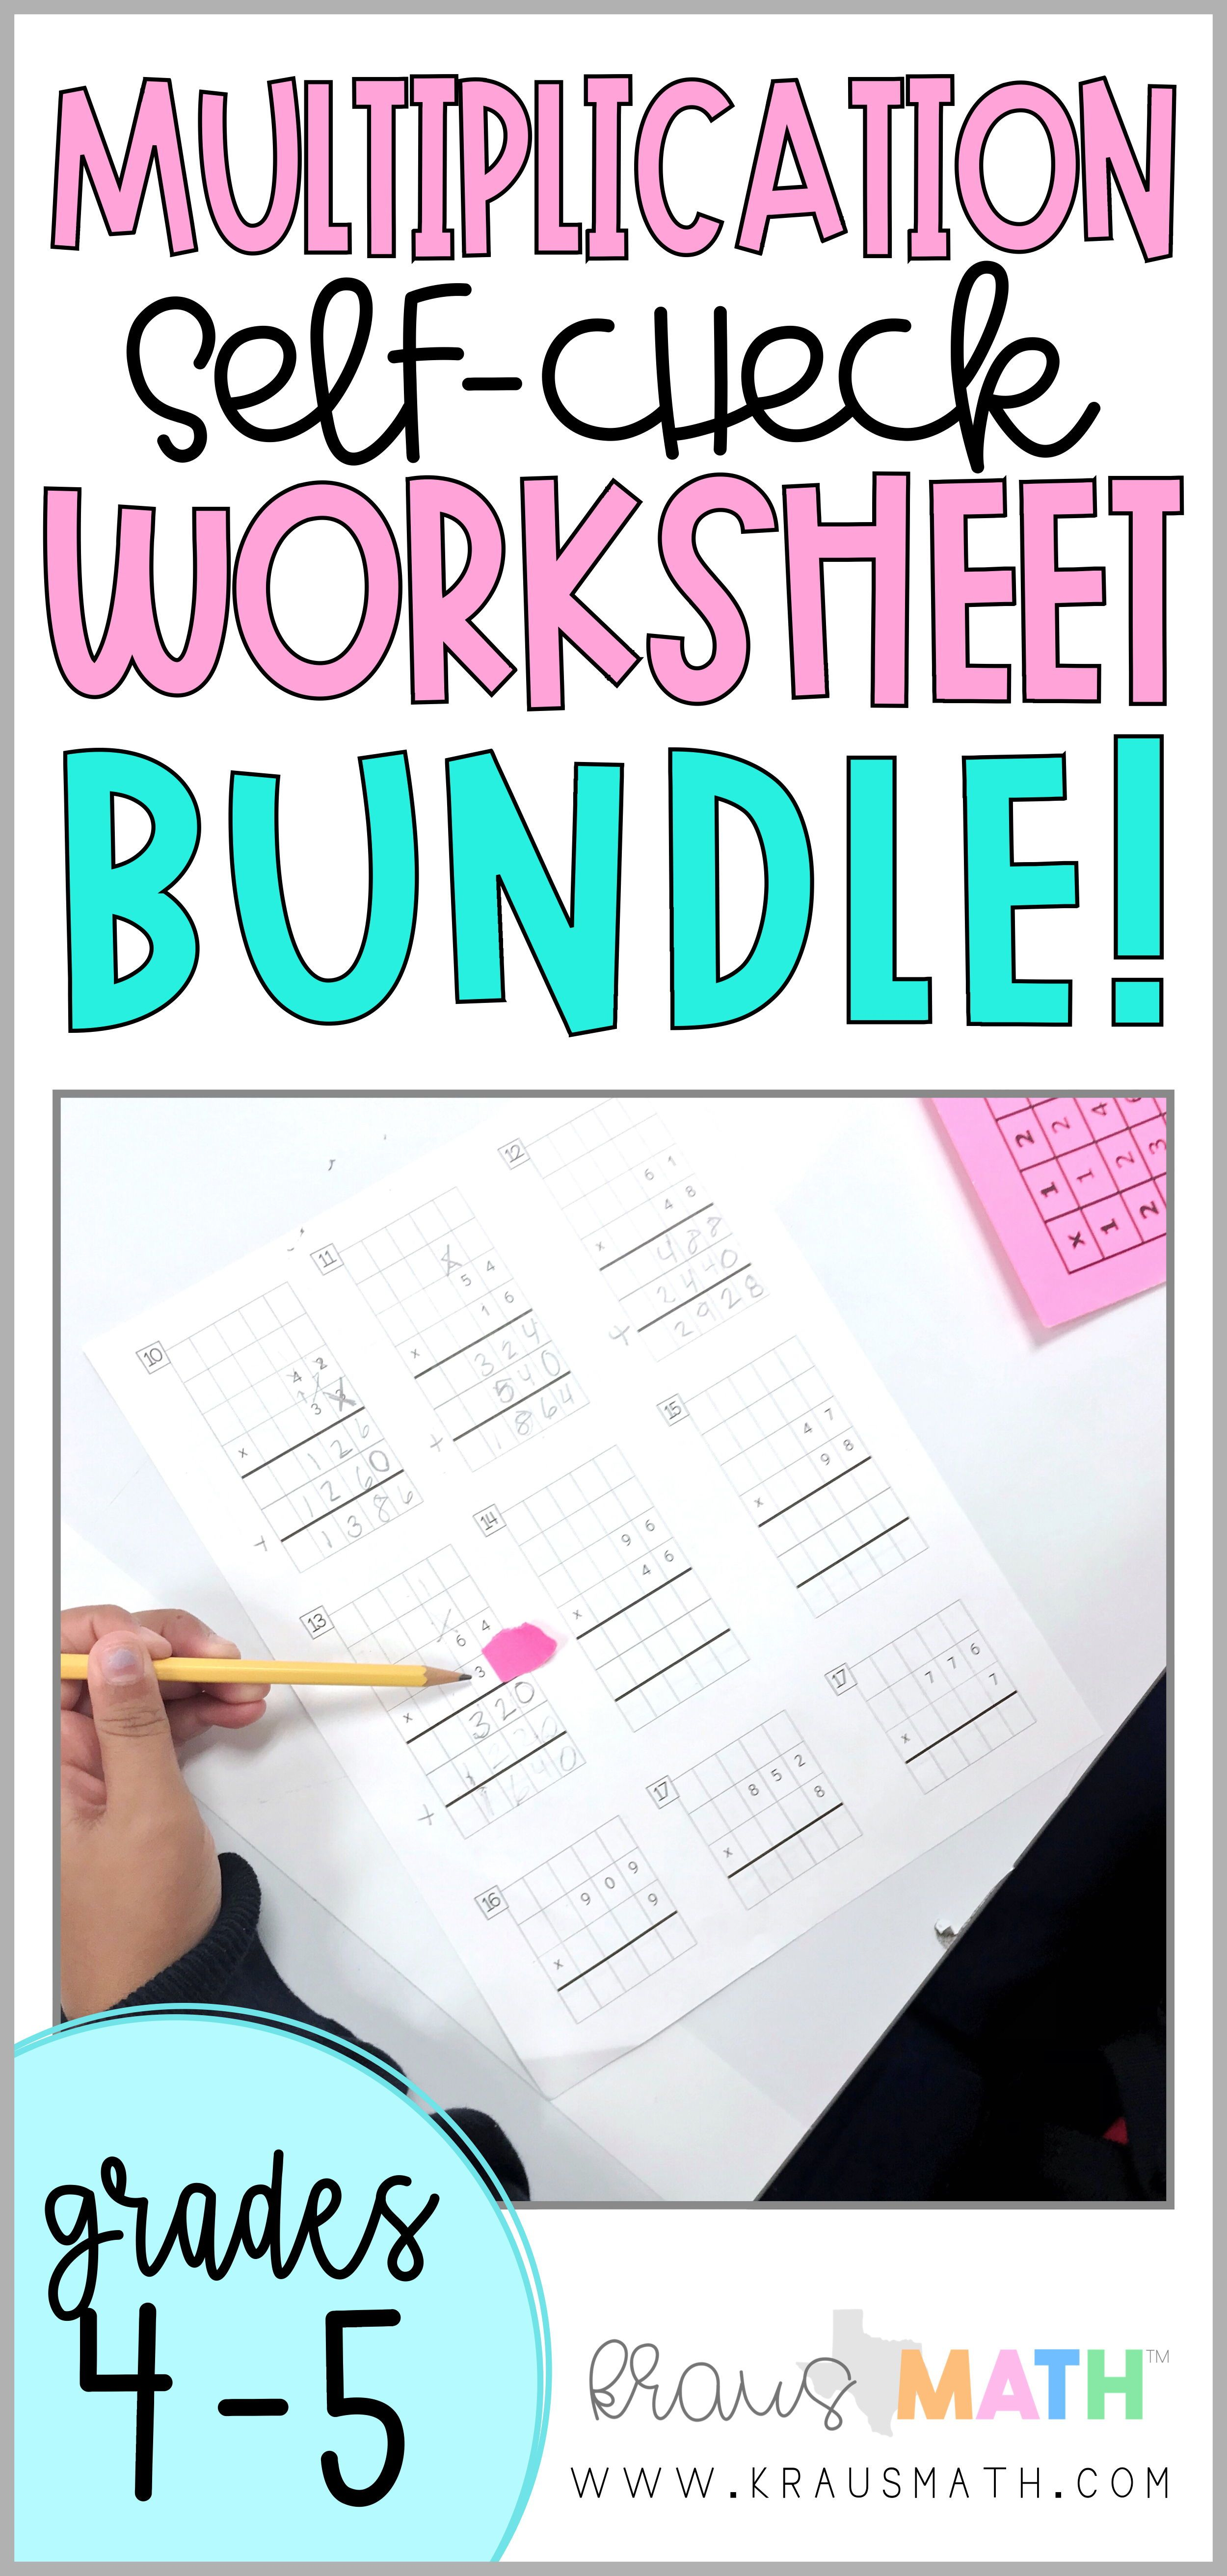 Multiplication 2x2 Amp 3x1 Self Check Worksheet Bundle